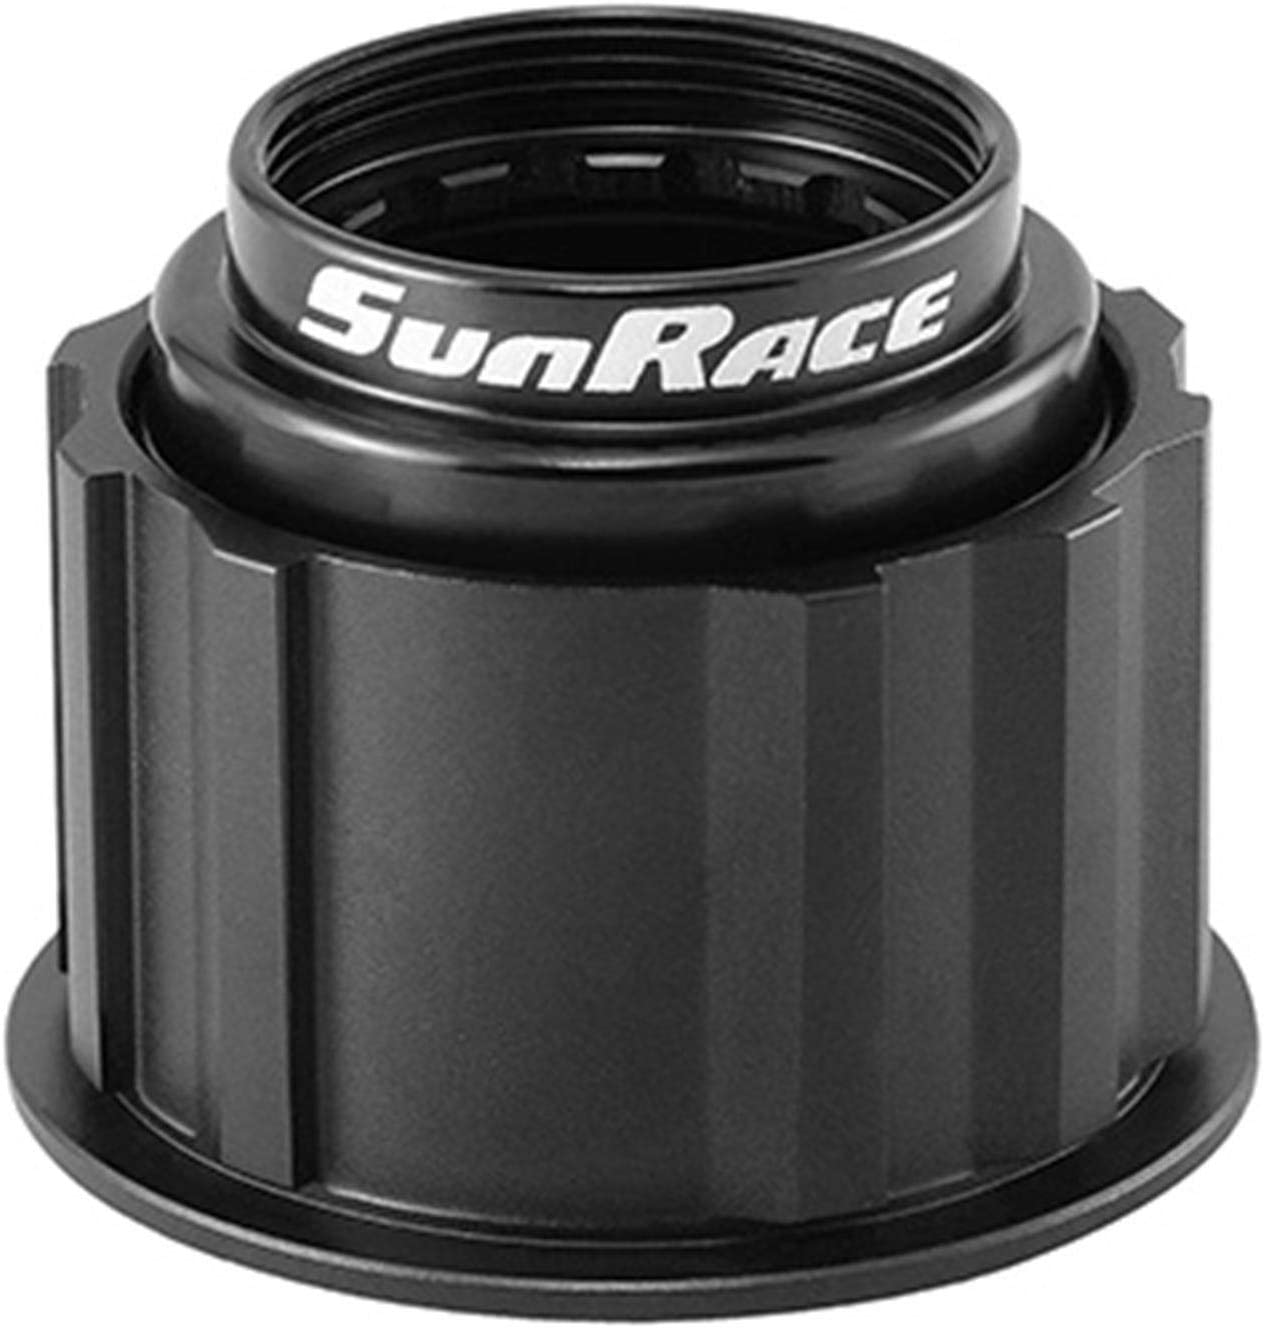 SunRace Csmz91X 12-Speed Xd-Driver Cassette 10-50T Black - 10-50T x 12 Speed - Black